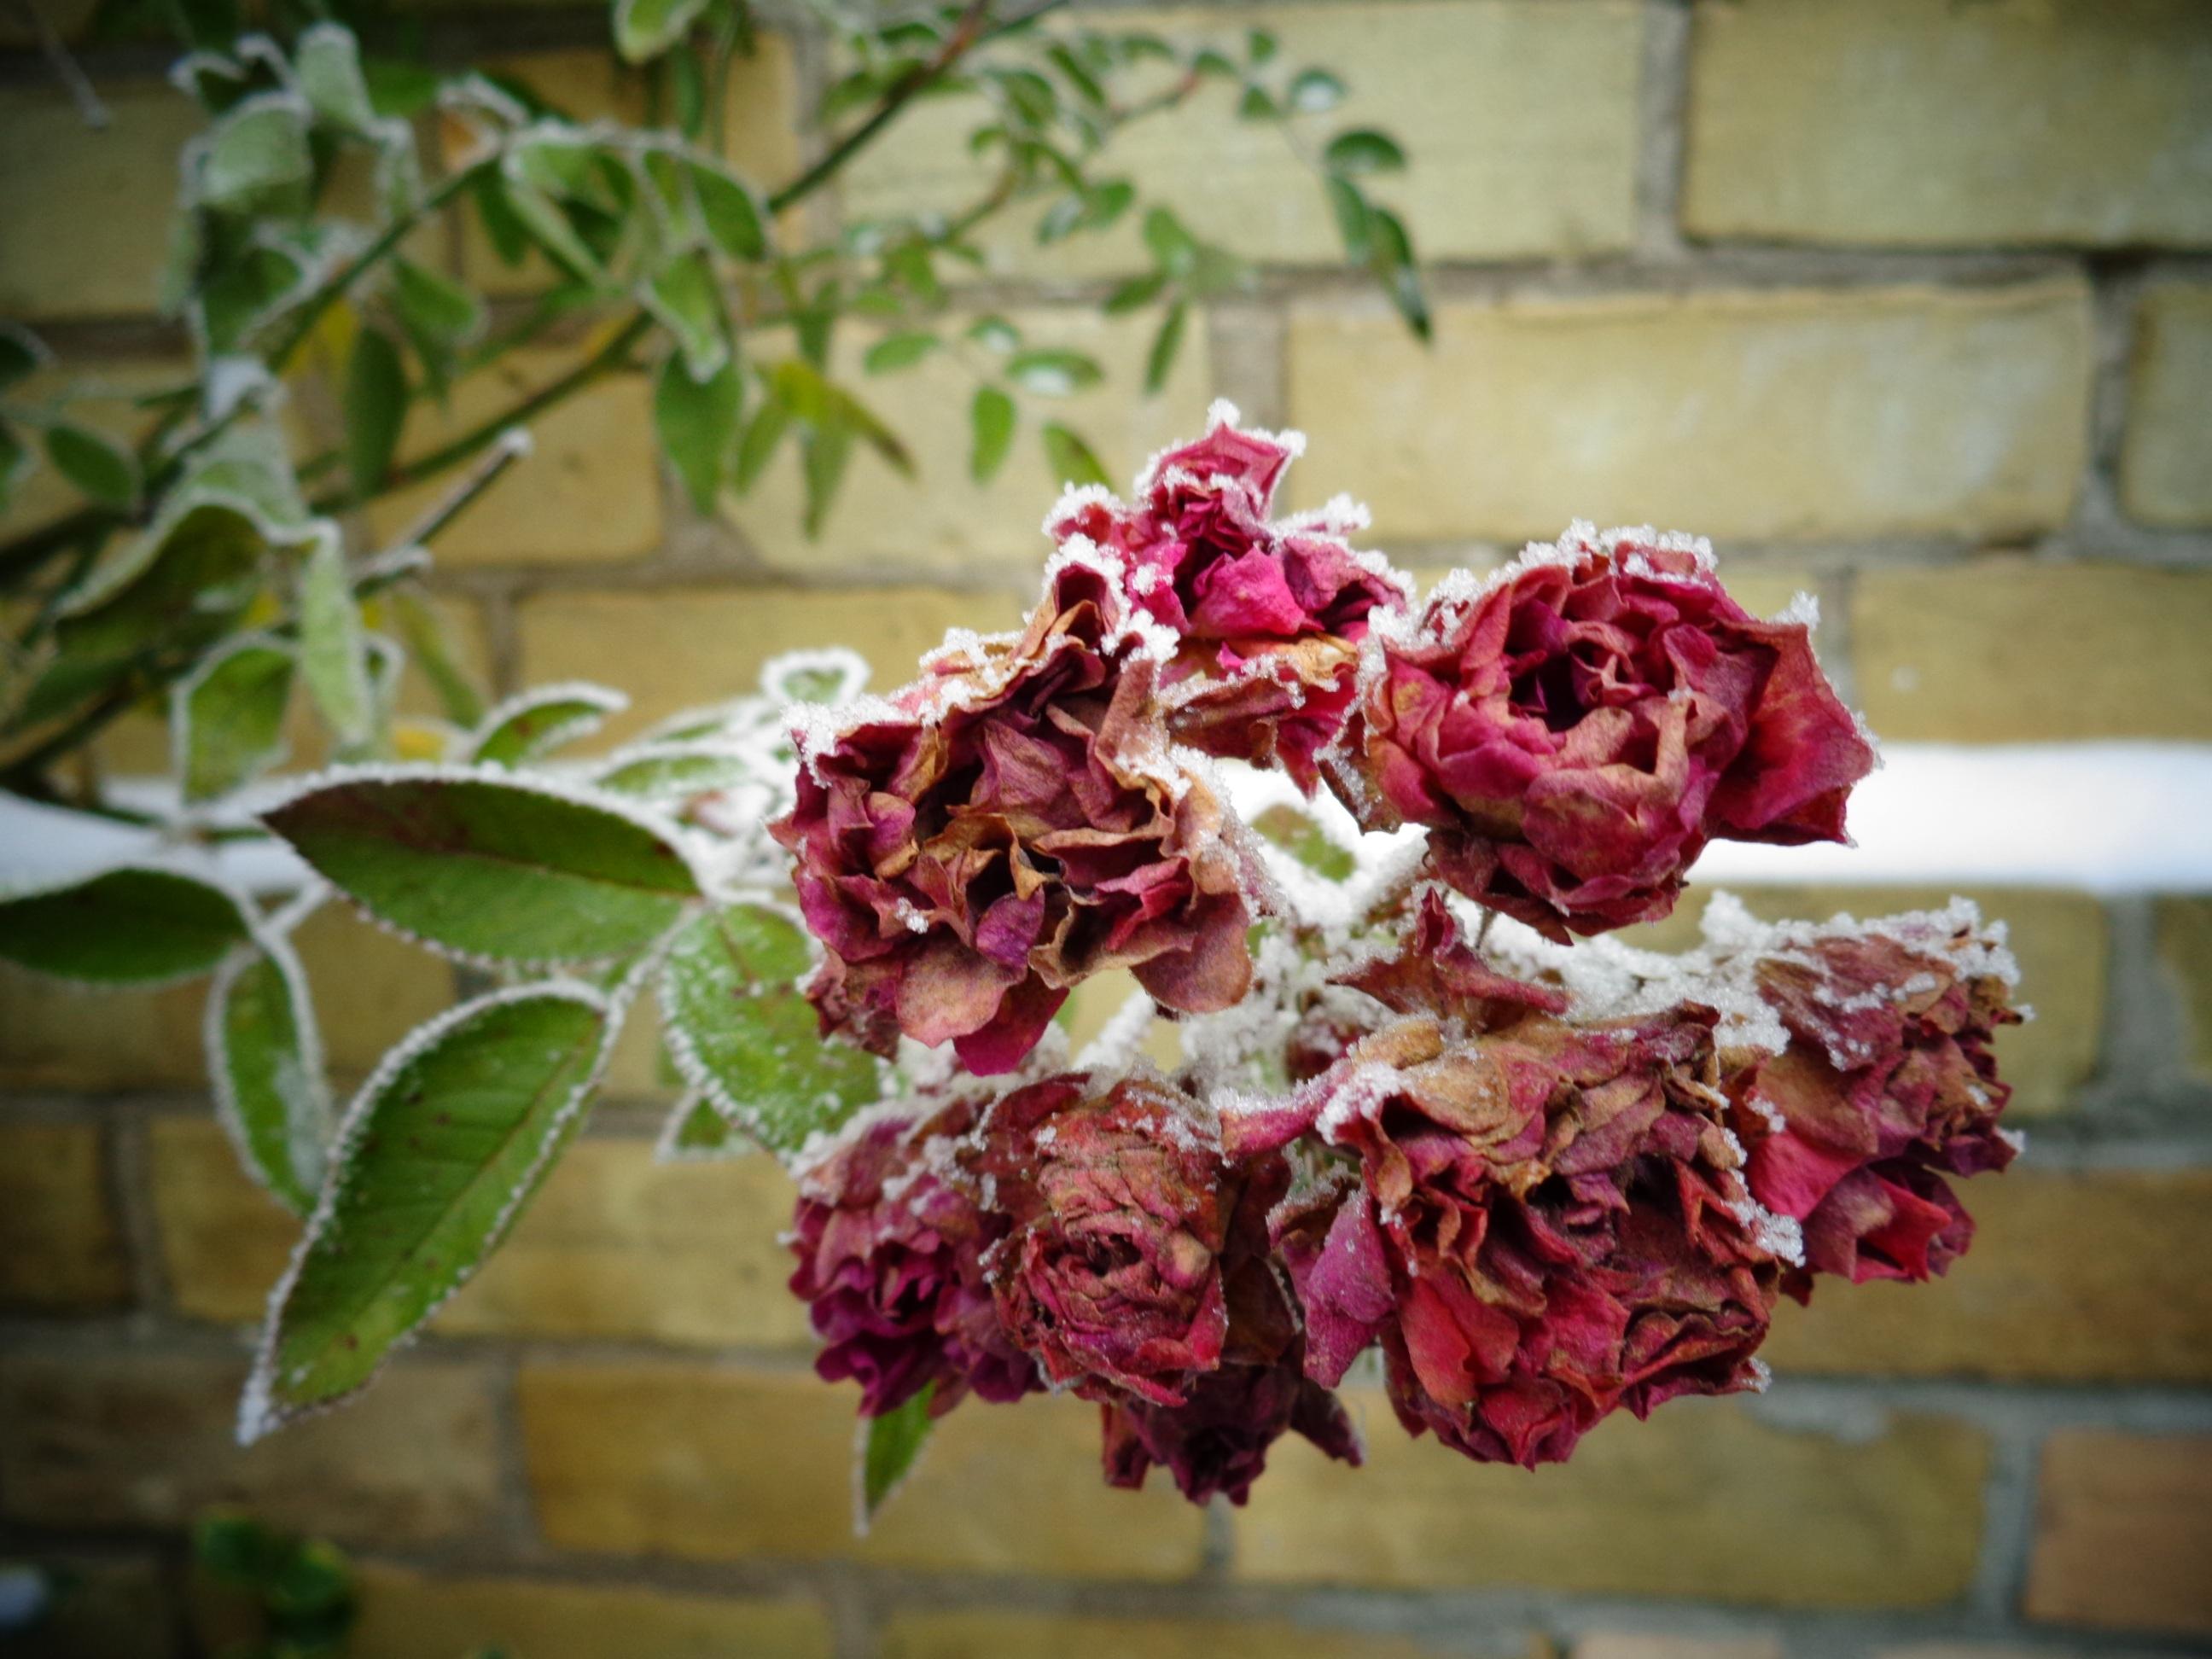 kostenlose foto bl hen schnee kalt winter frucht blatt blume bl tenblatt frost eis. Black Bedroom Furniture Sets. Home Design Ideas